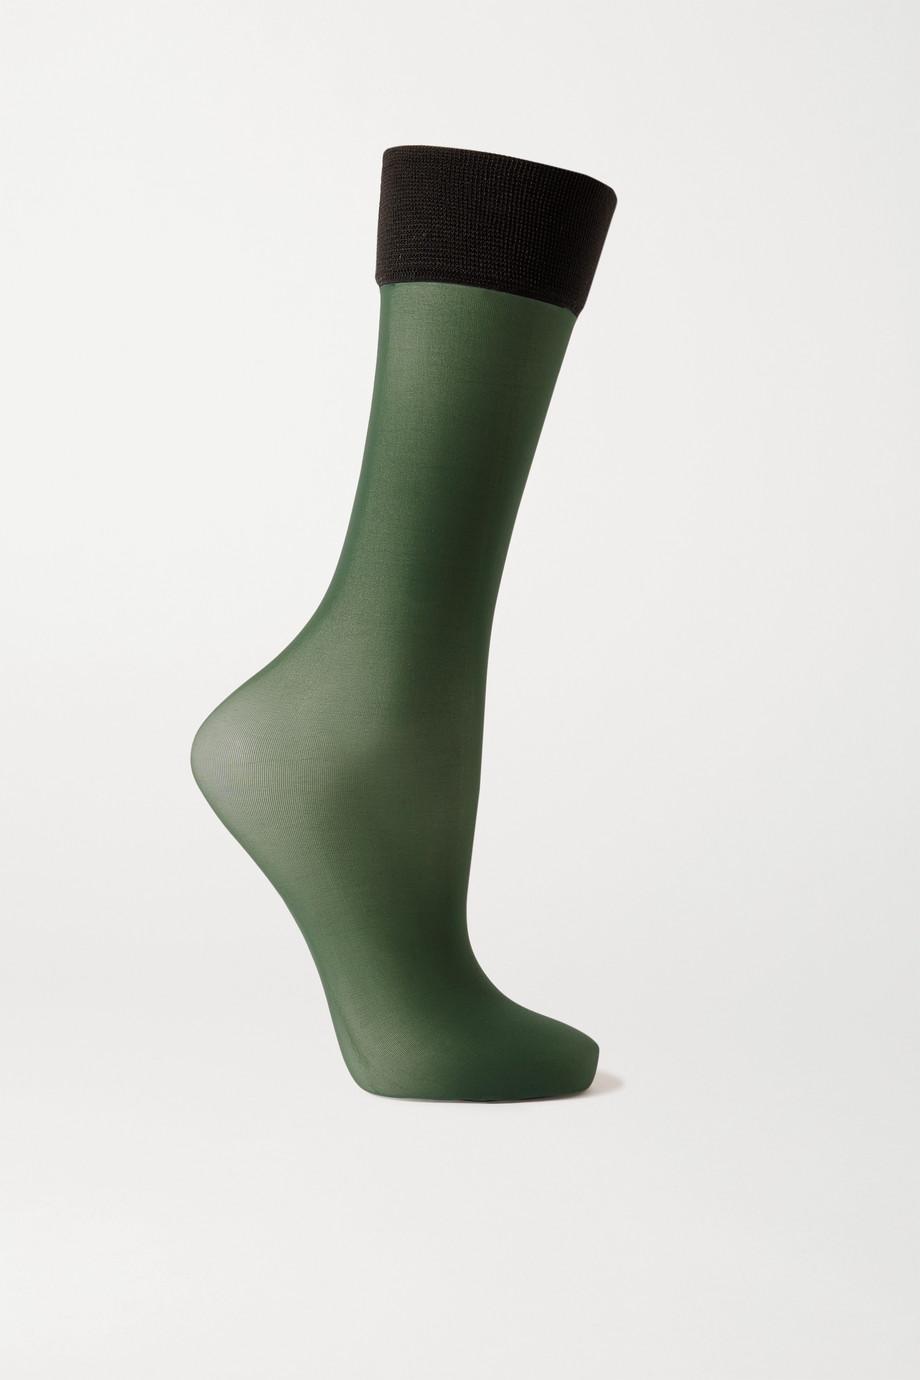 Dries Van Noten Two-tone 20 denier socks